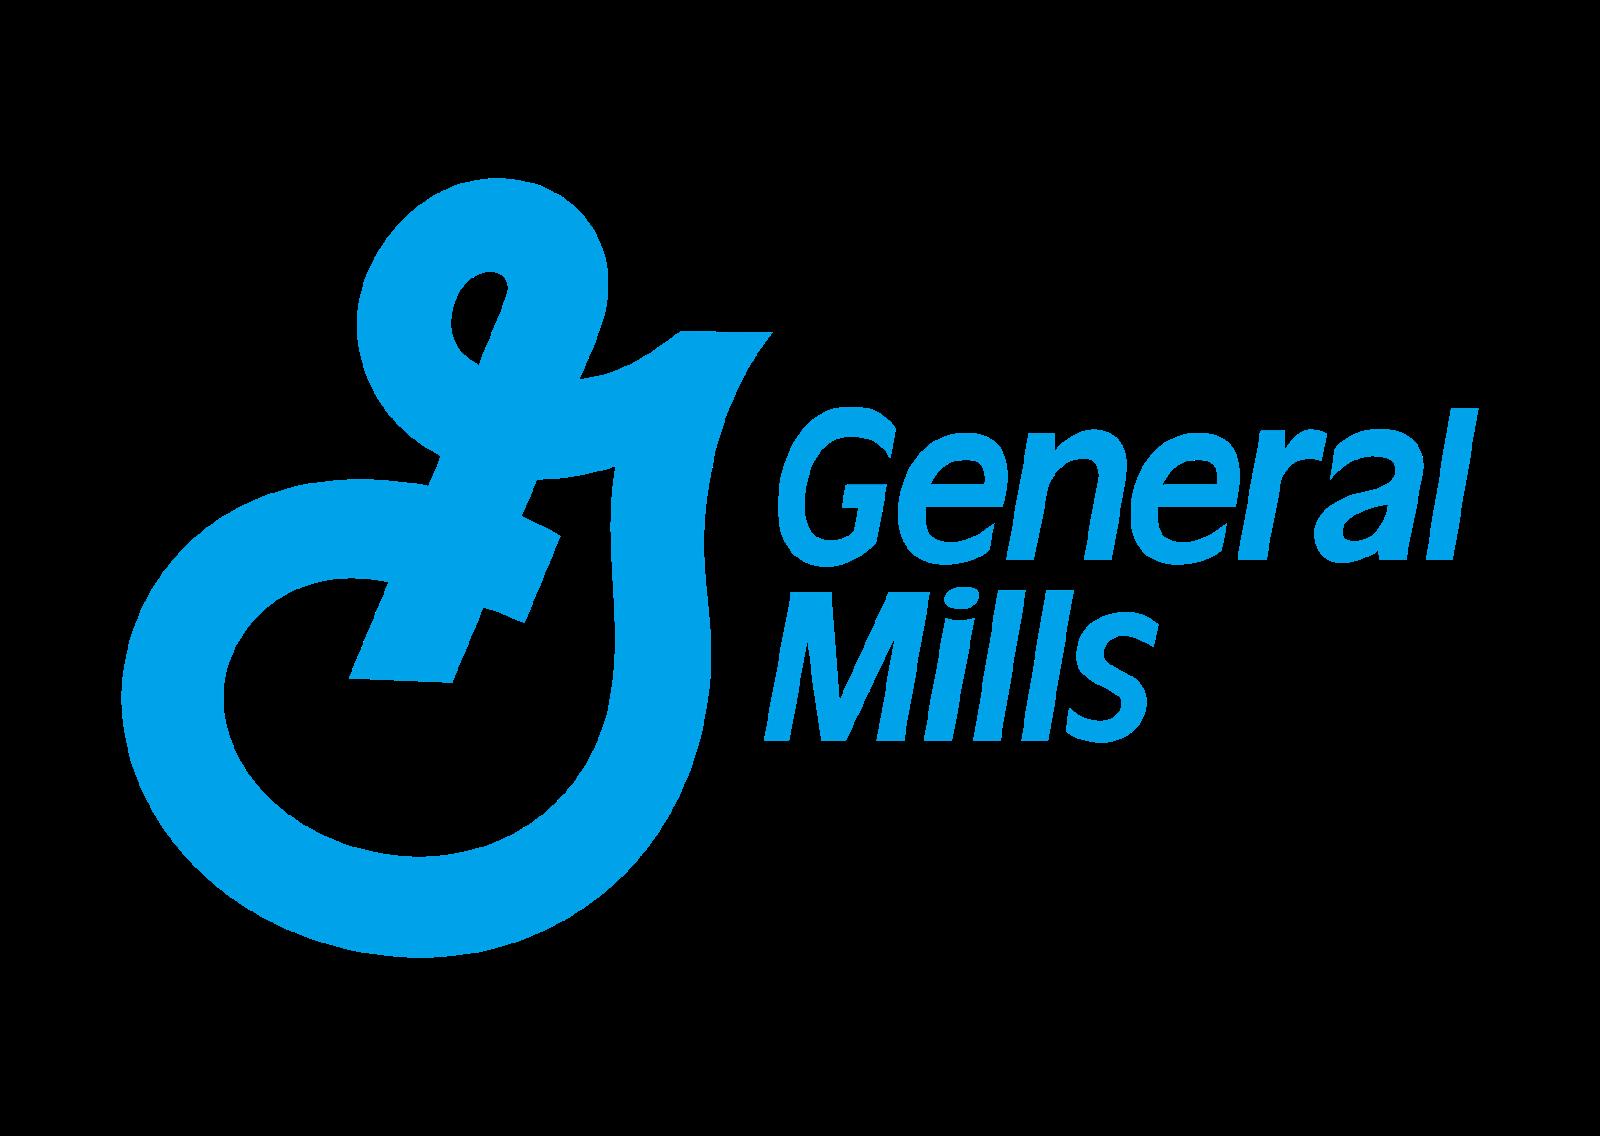 General Mills vector logo.png